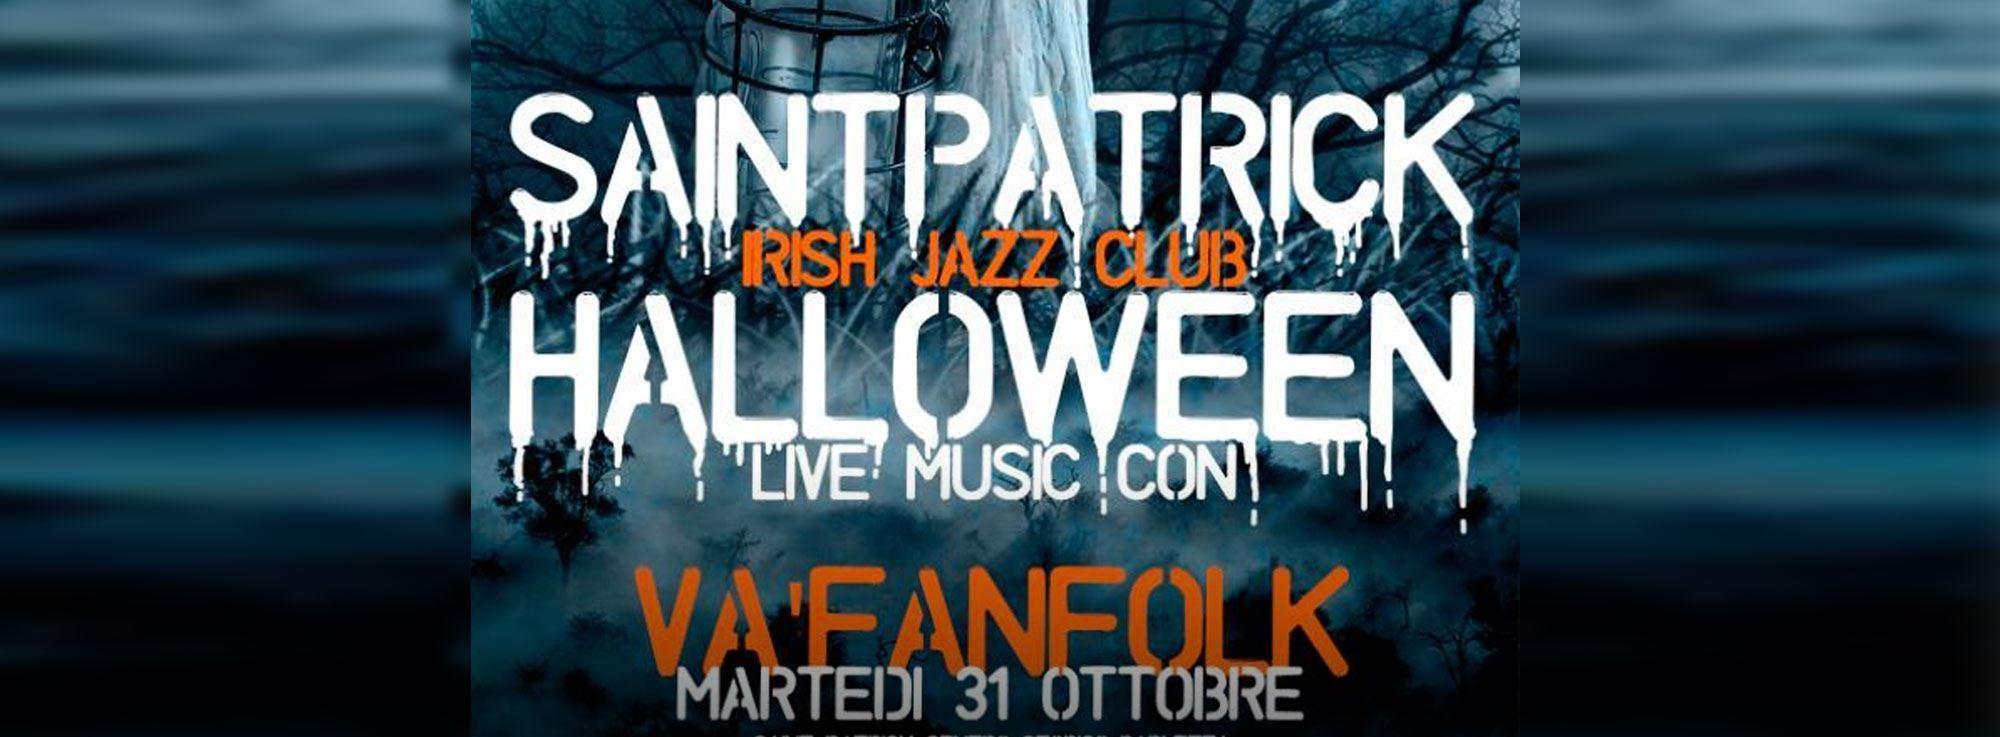 Barletta: Notte di Halloween al Sain Patrick